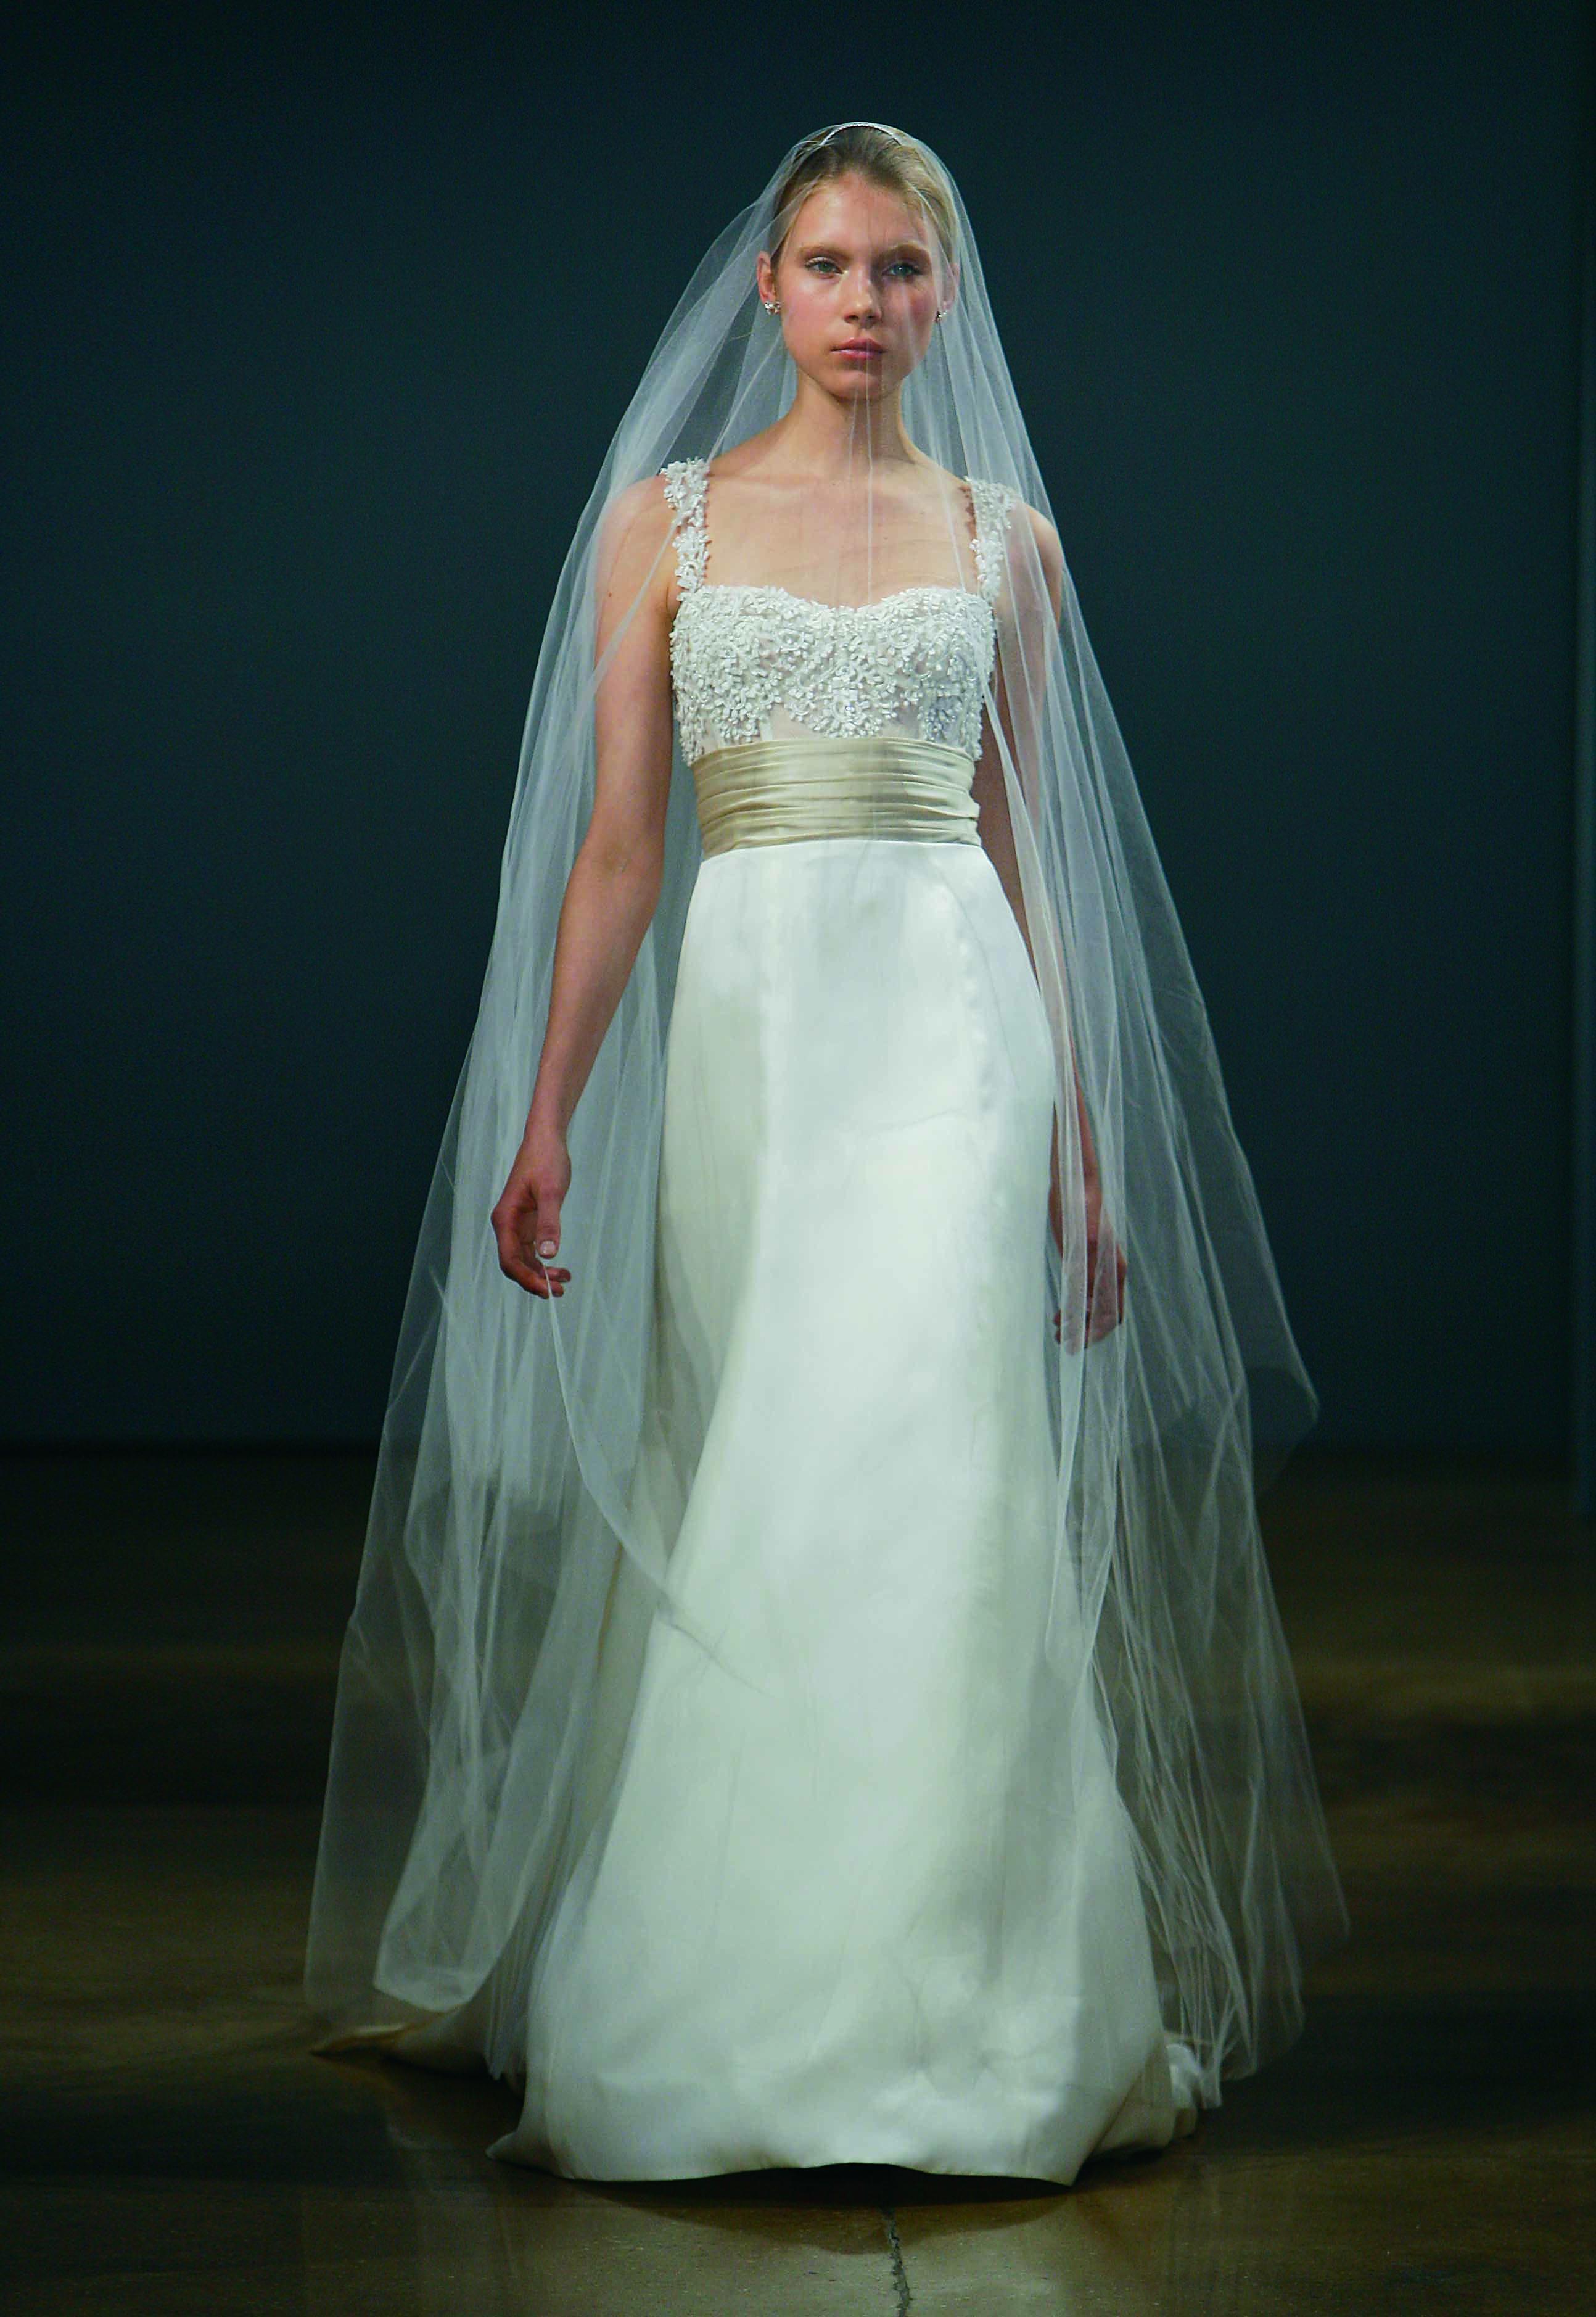 Fancy Used Bridal Gowns Image - Wedding Dress - googeb.com